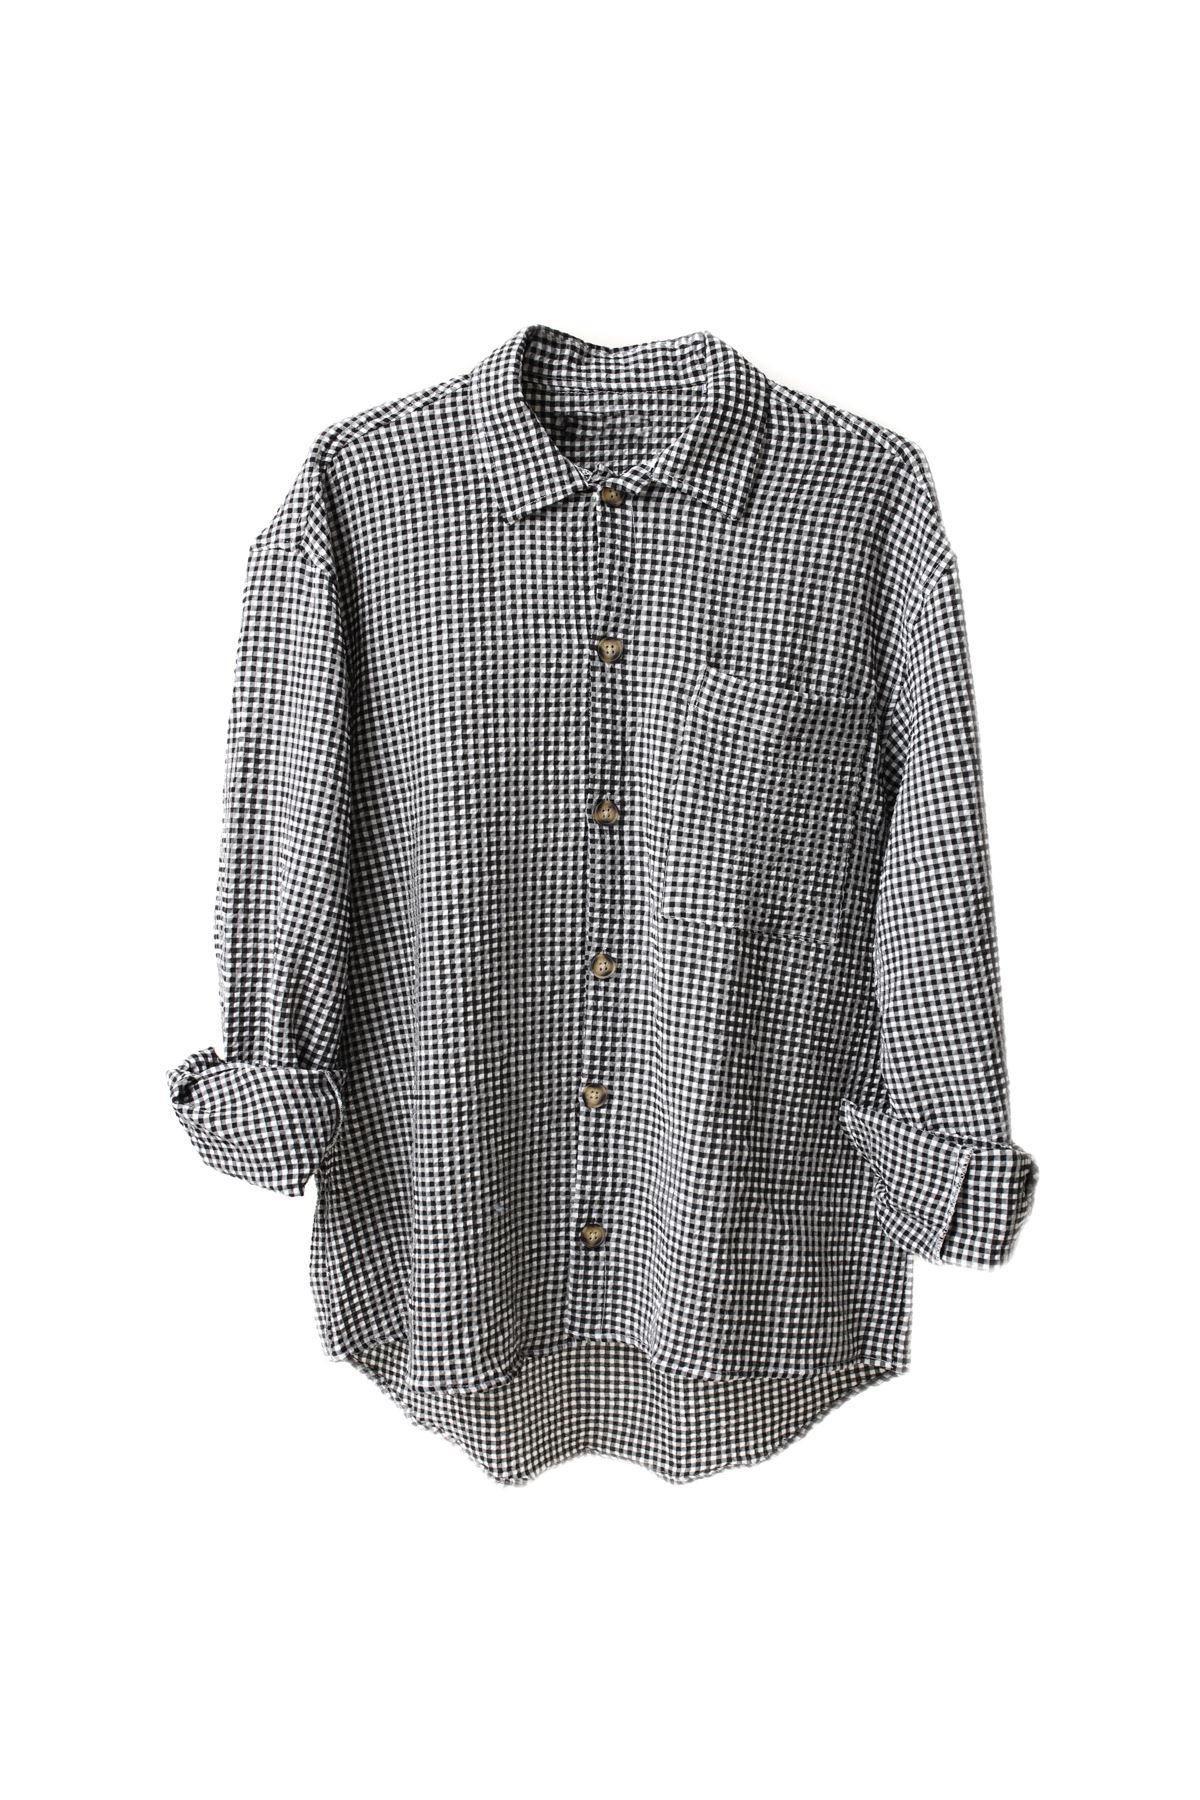 Siyah Gofre Gömlek